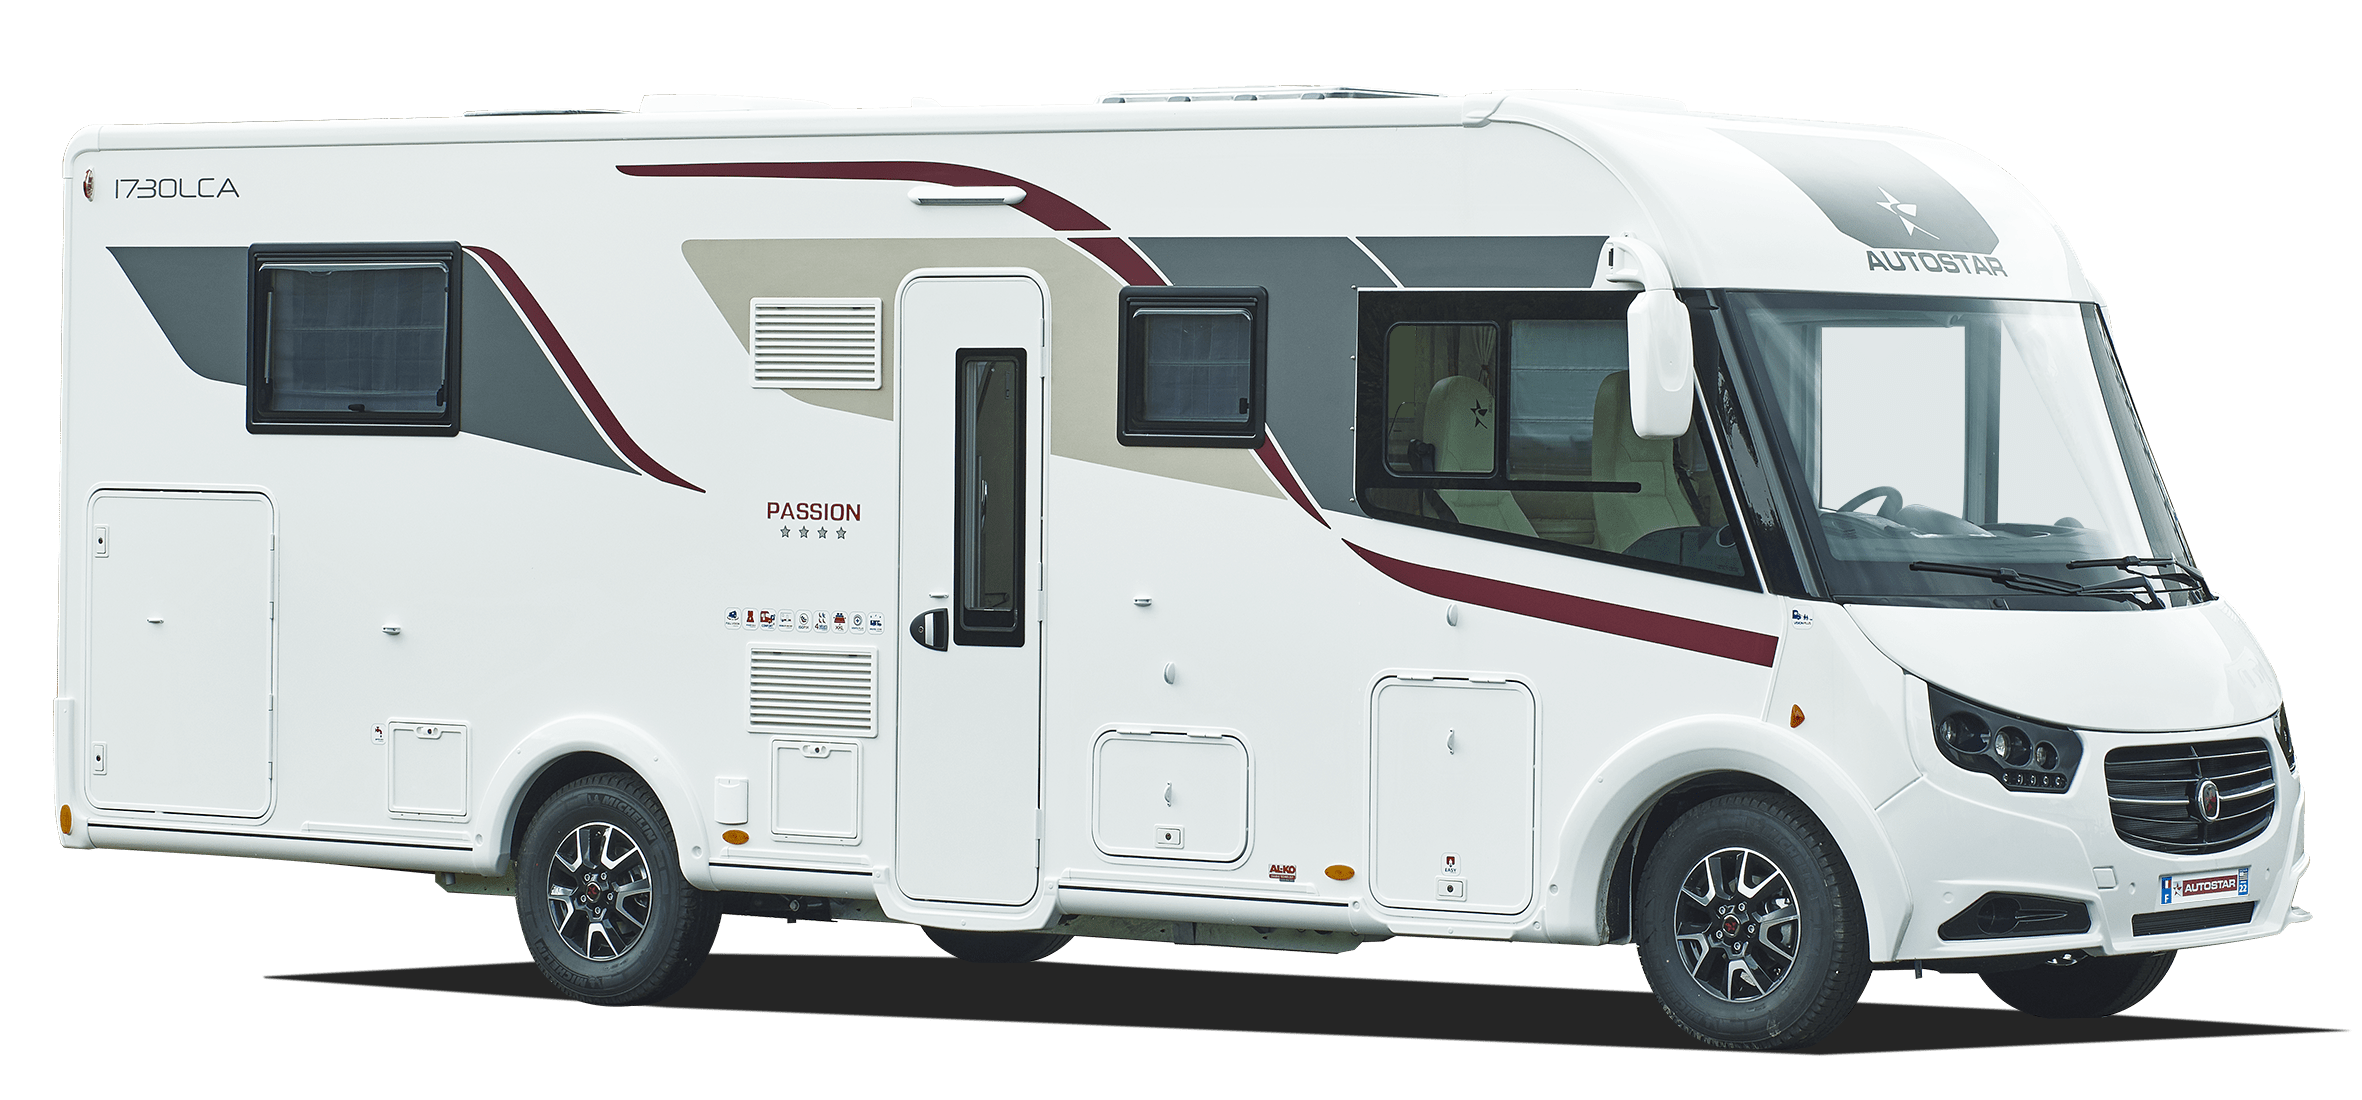 I730 LCA